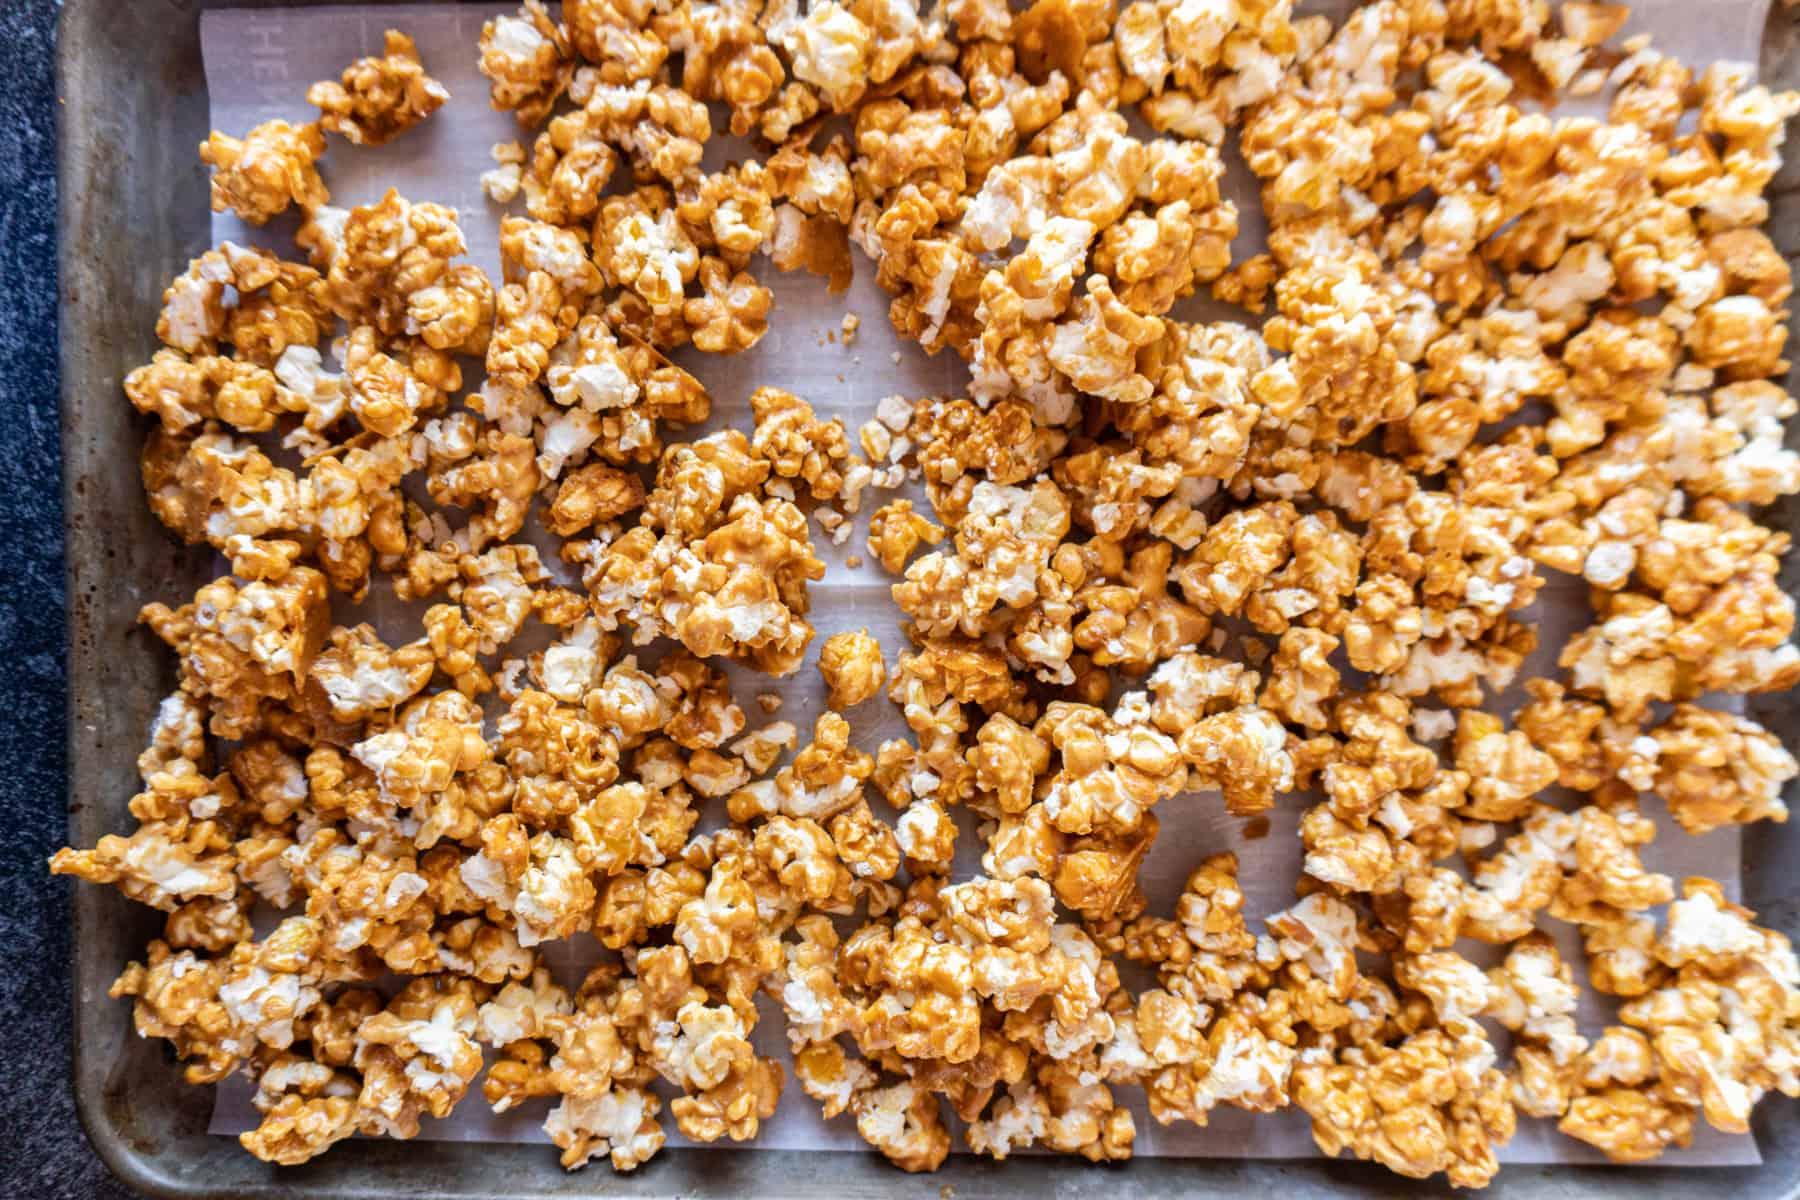 caramel popcorn after being baked on baking sheet